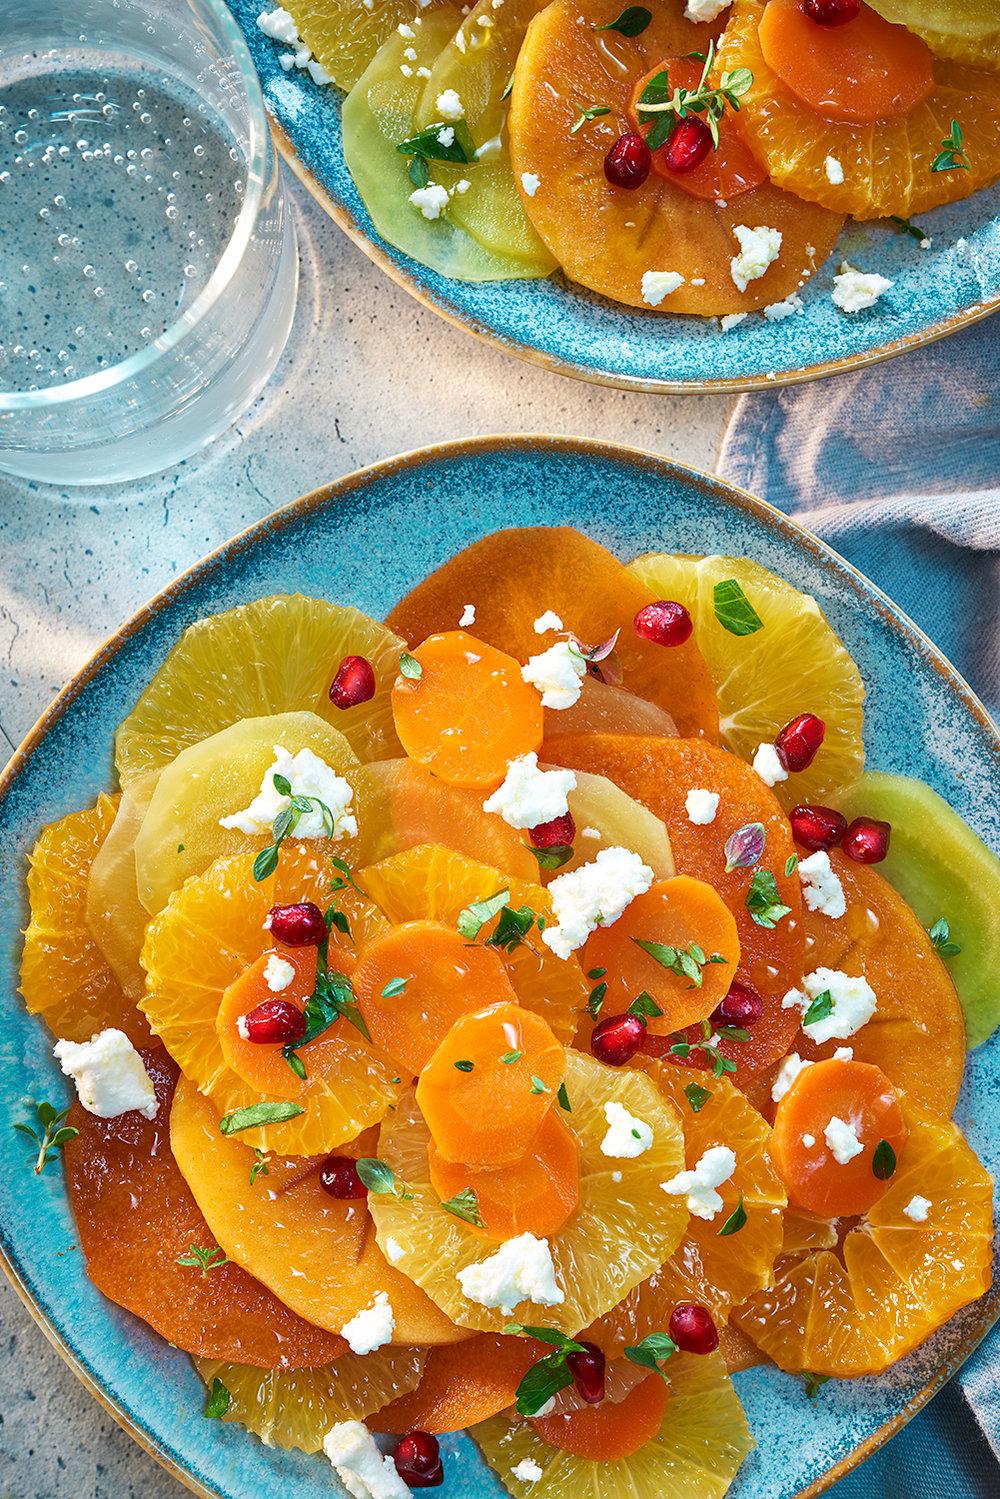 Winter-Persimmon-Citrus-Salad_0250_original.jpg